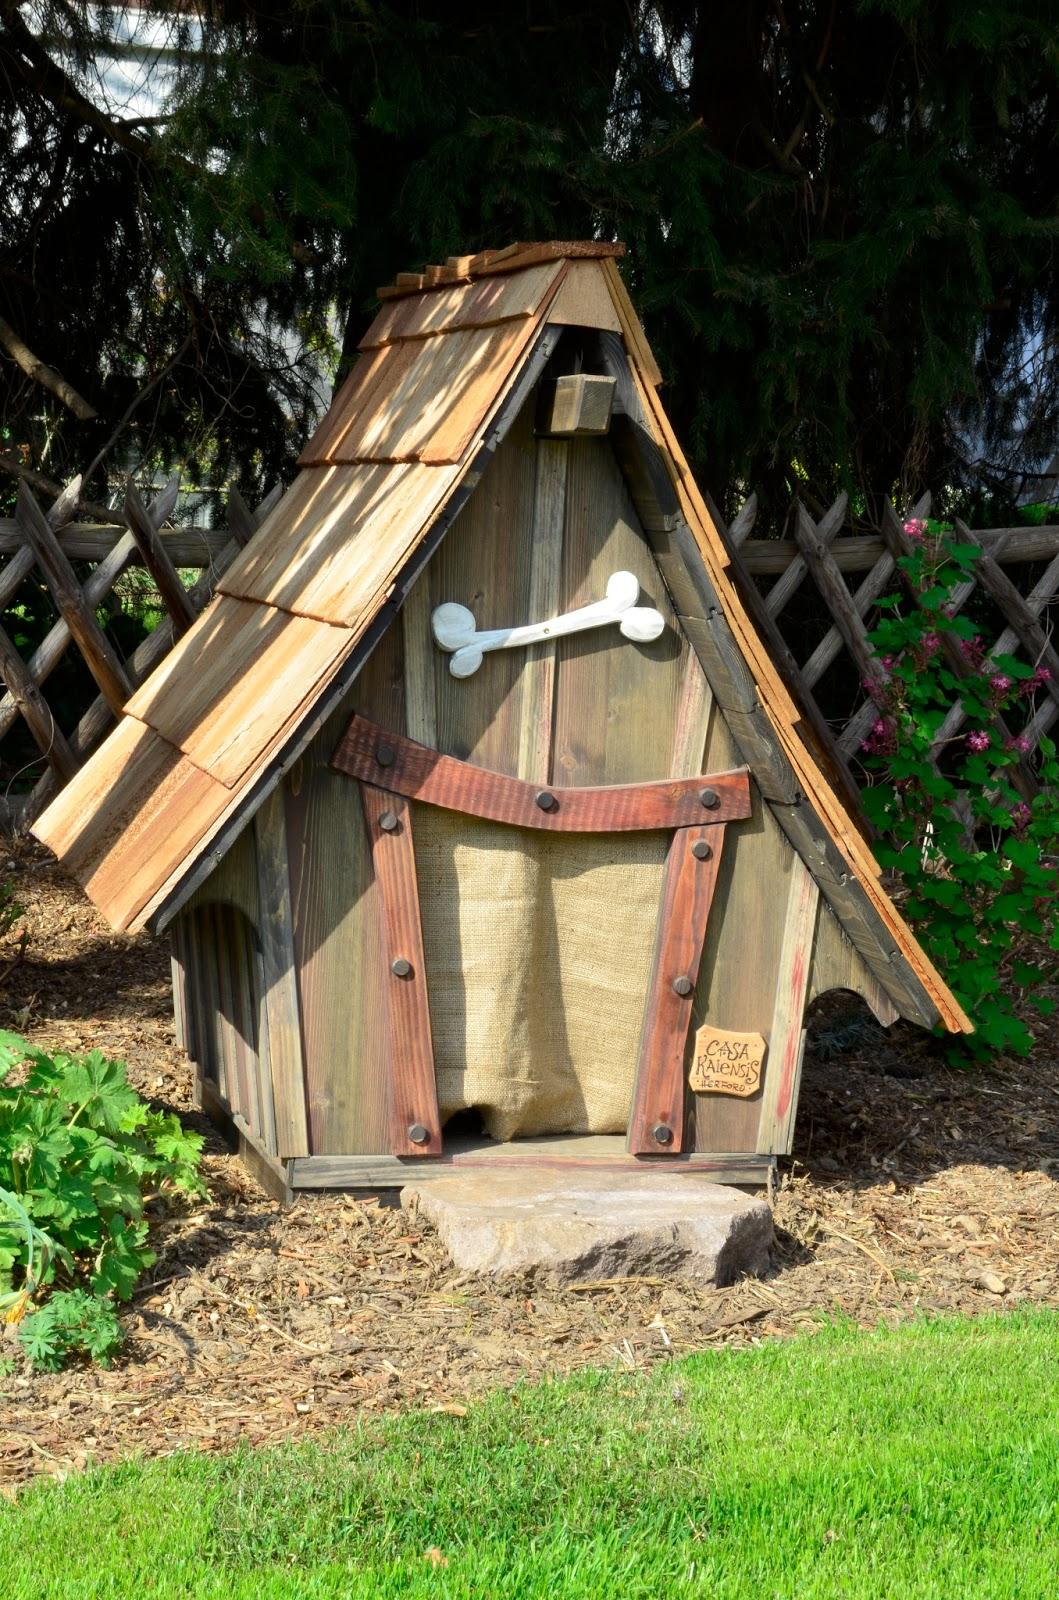 meiselbach mobilheime: hundehütte rhubart - in märchenhafter ausführung